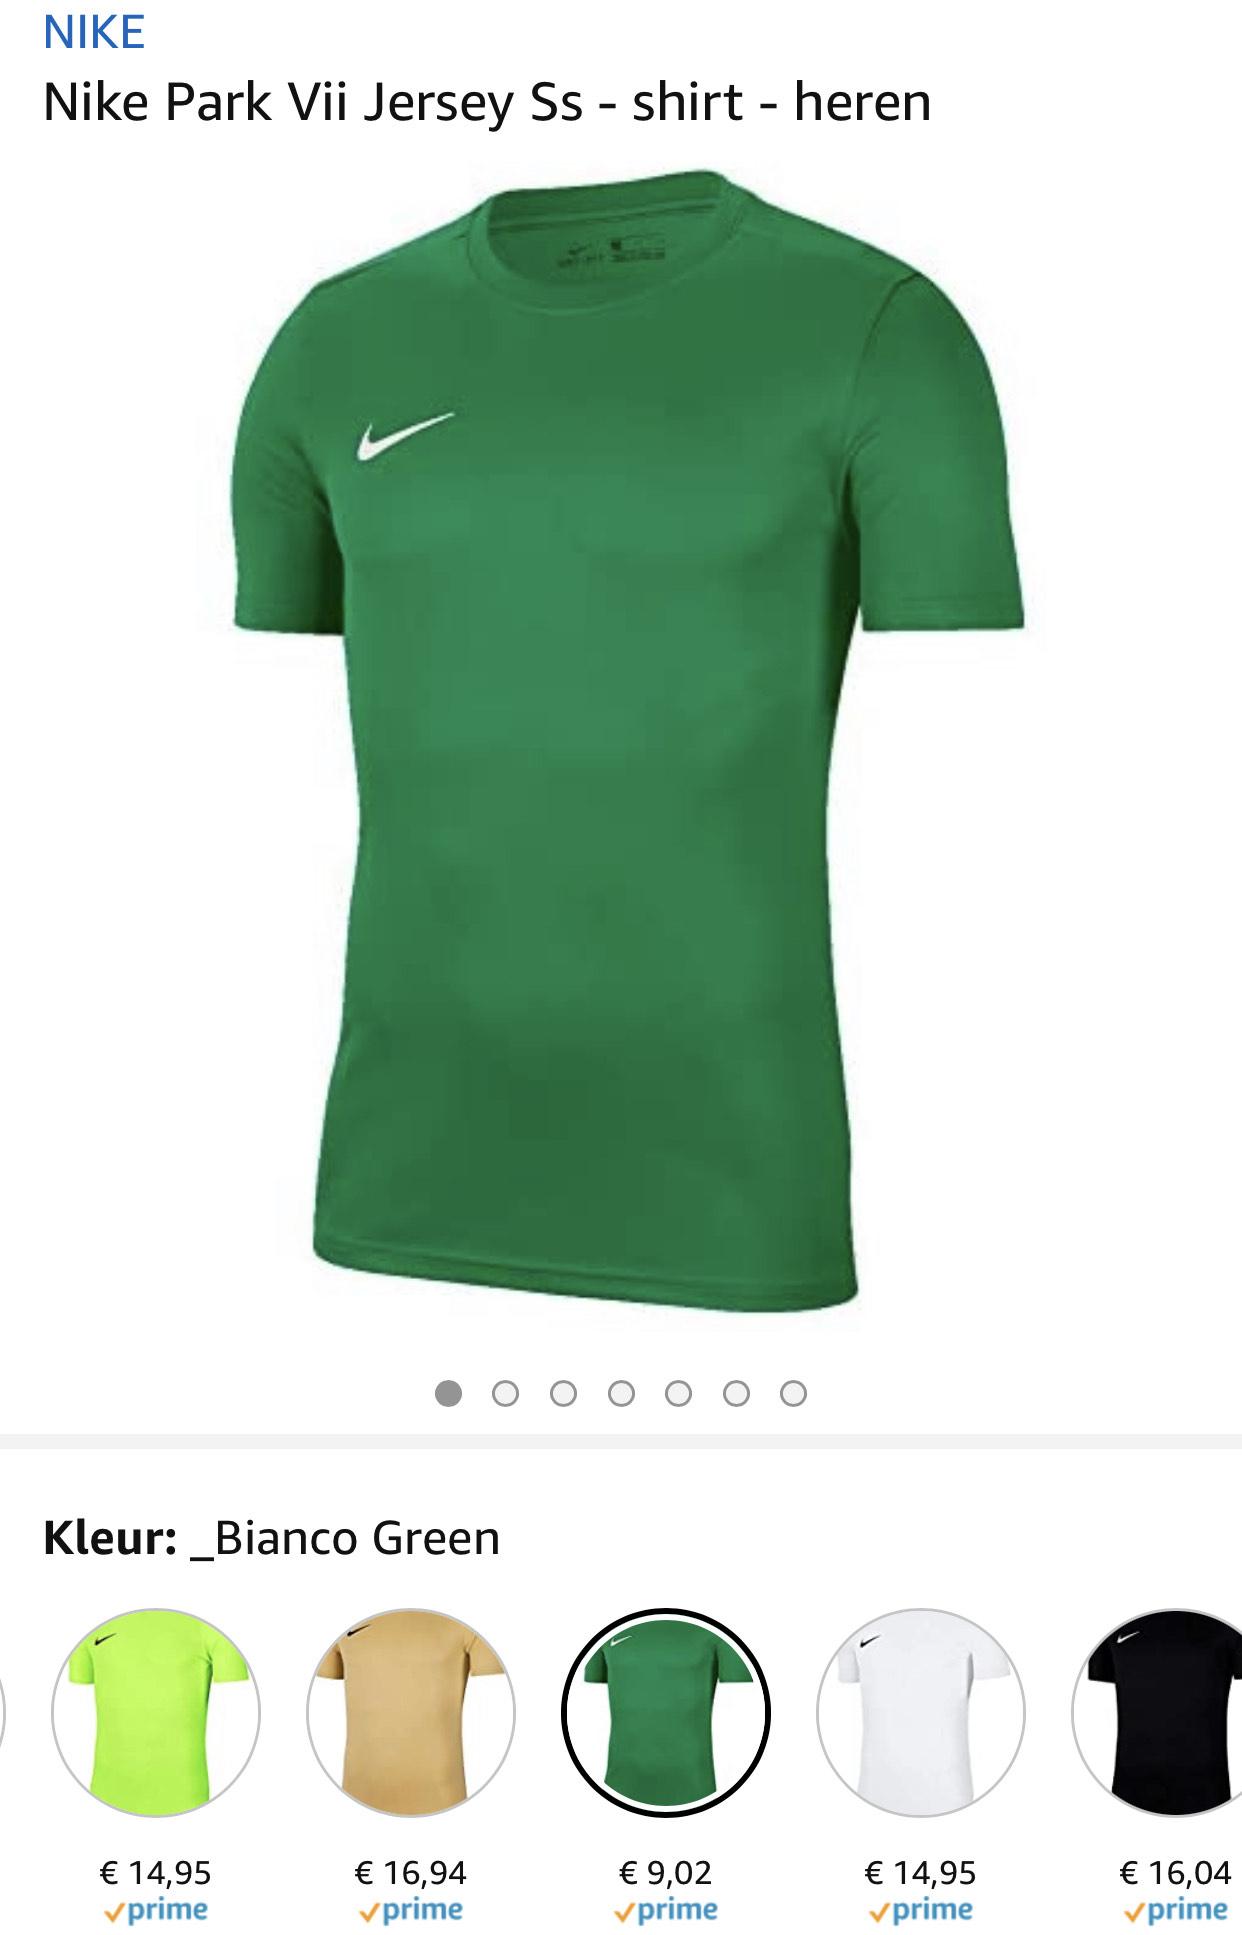 Nike Heren t-shirt vanaf €9,02